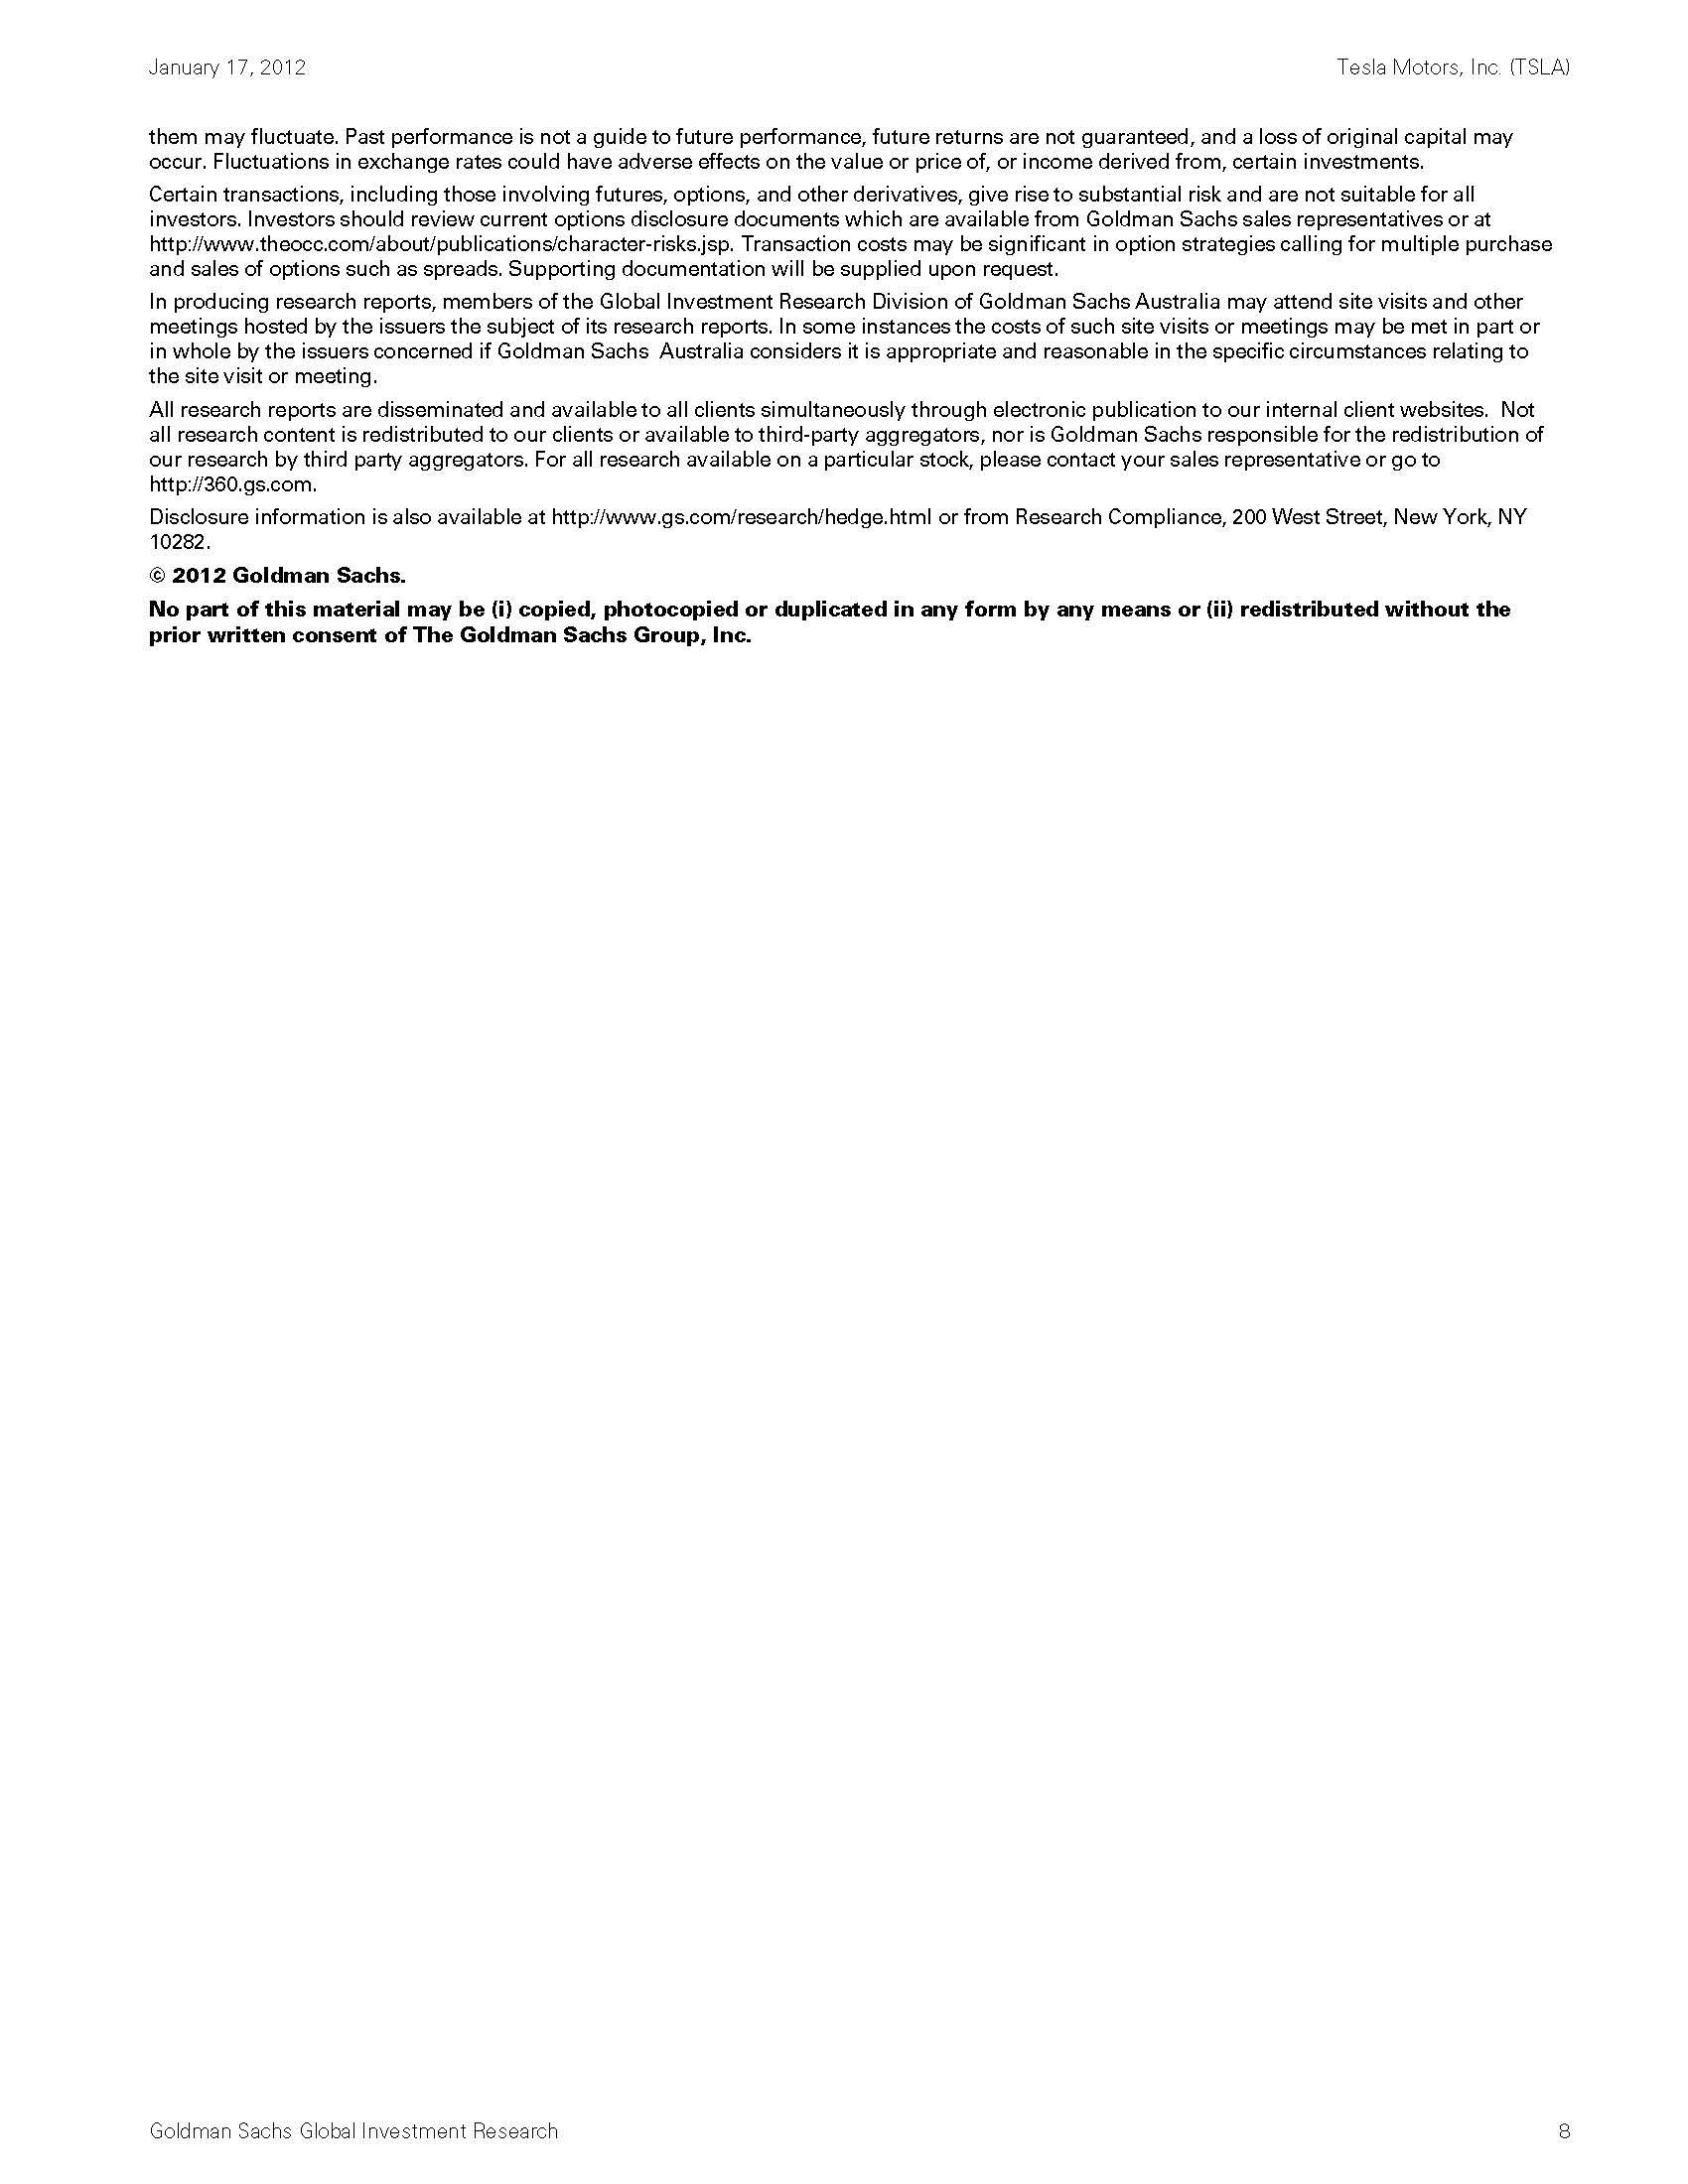 tesla_goldman_Page_8.jpg